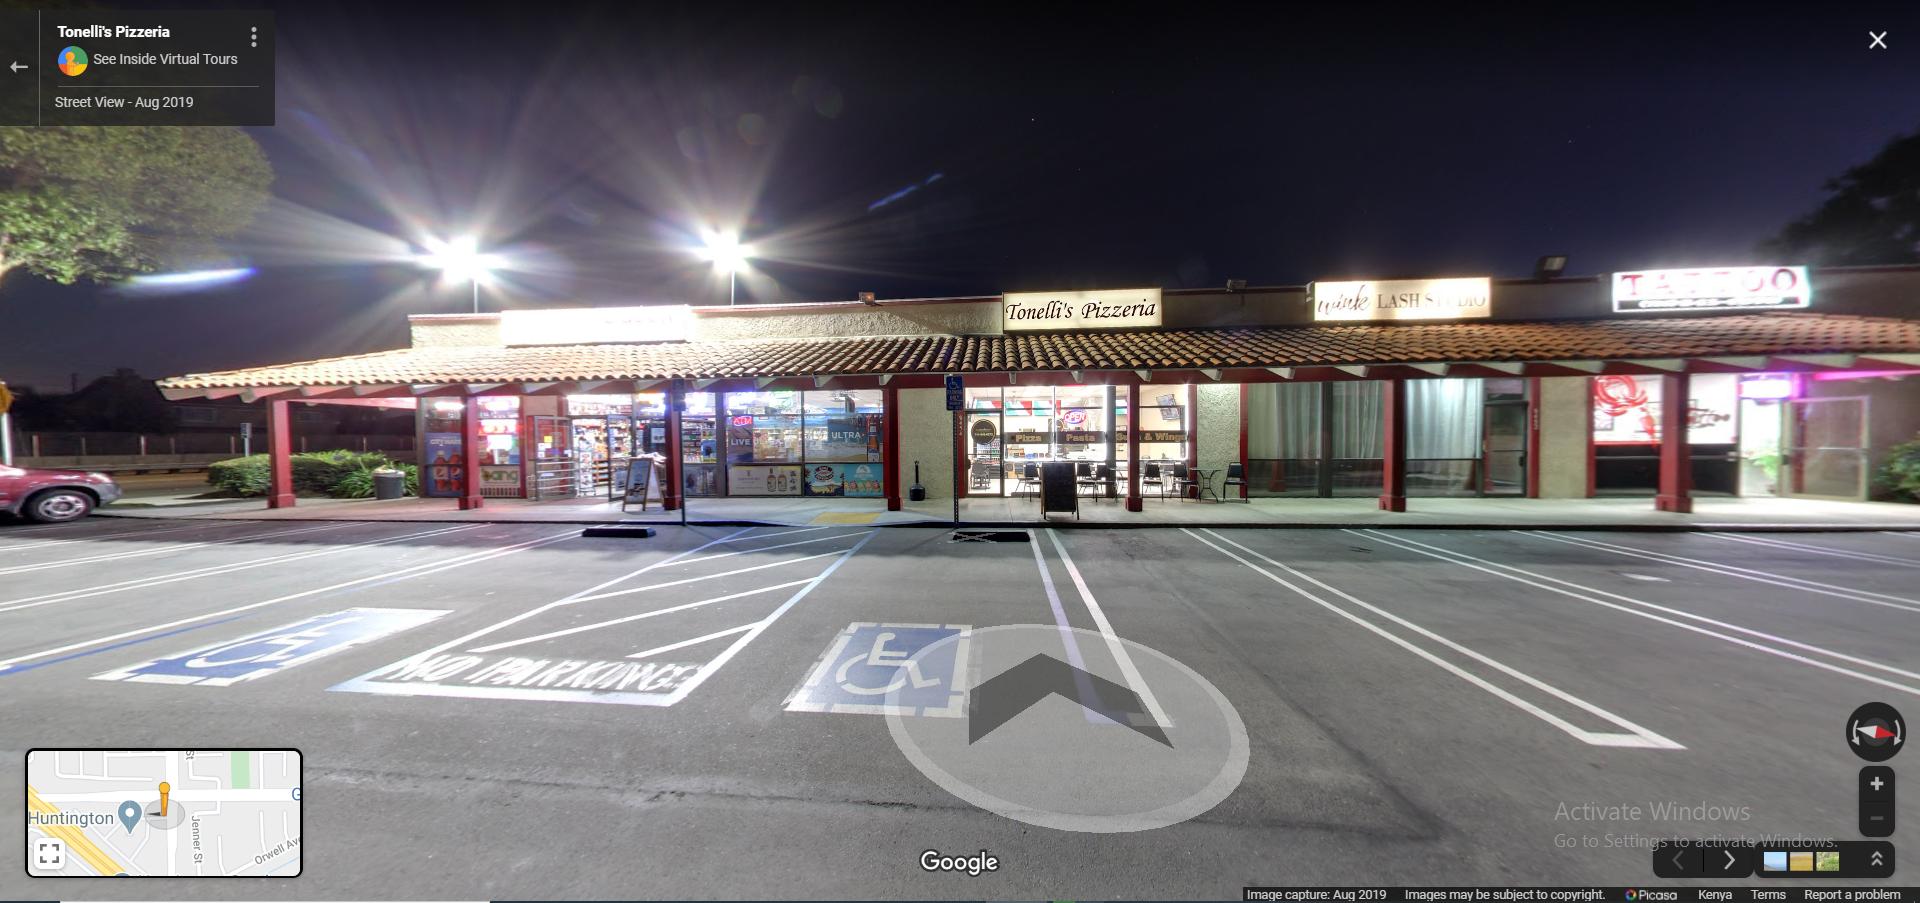 Tonelli's Pizzeria - Huntington Beach